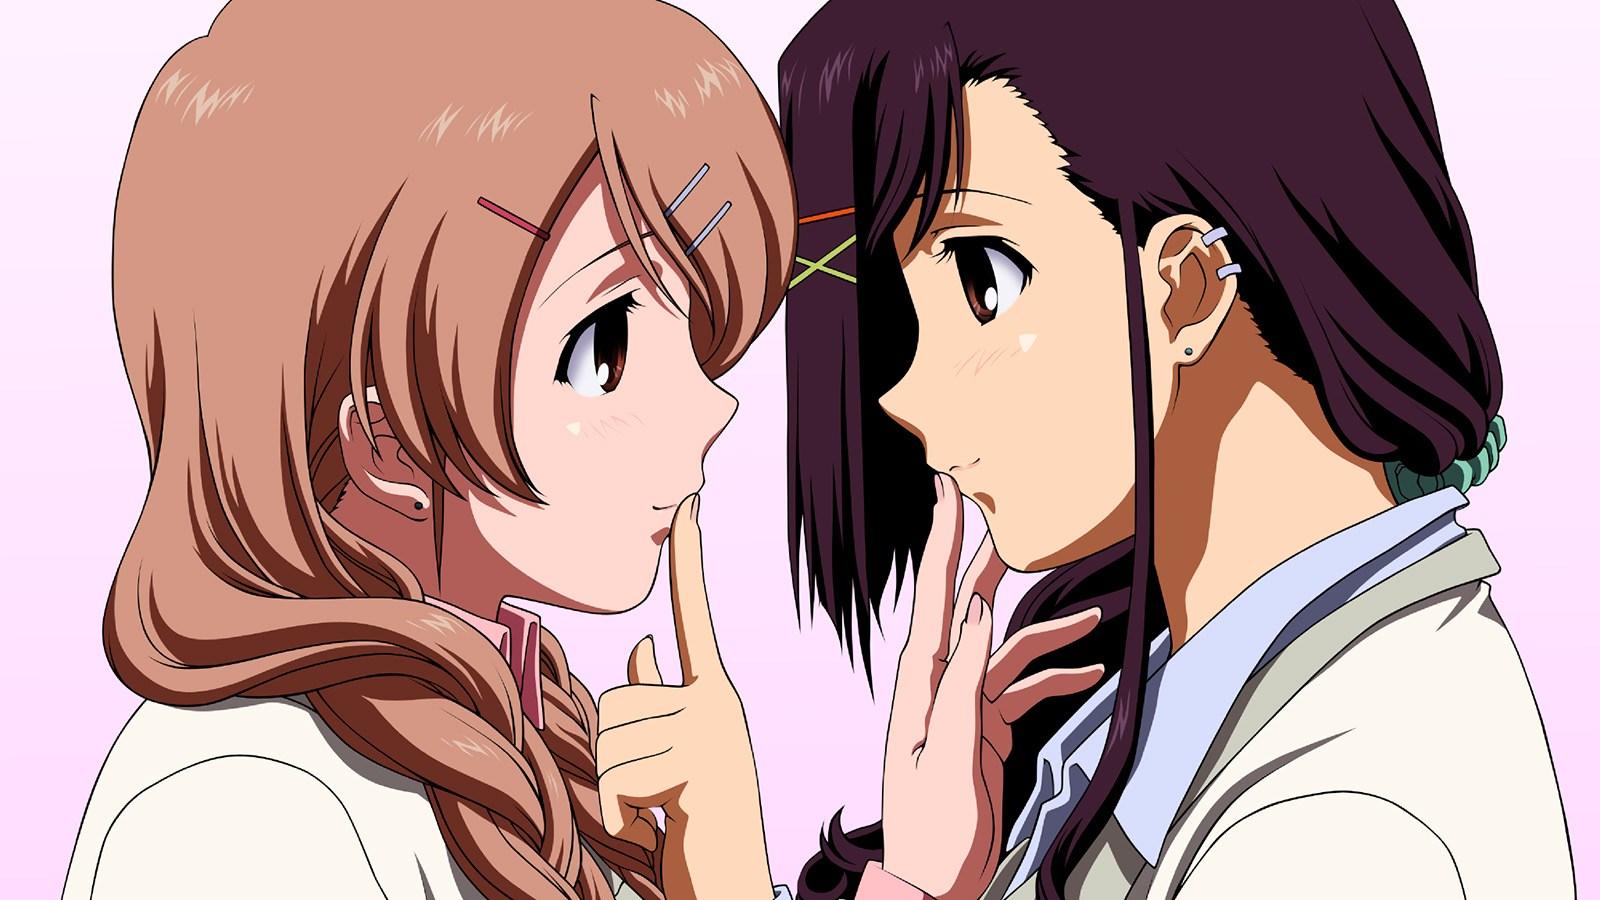 animeblog/2017/07/16/top-10-yuri-anime-best-recommendation/